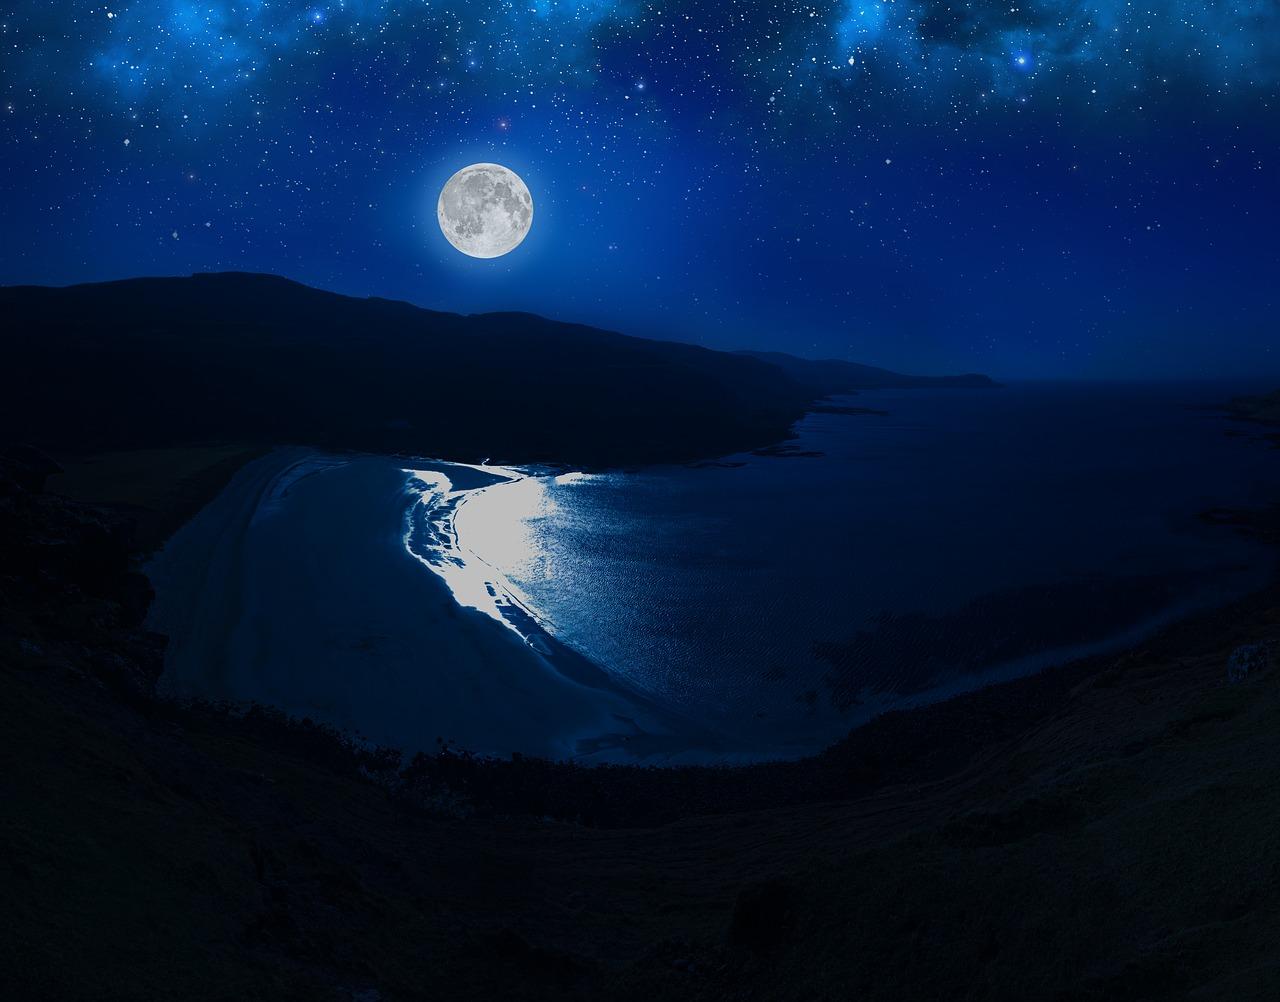 Лунный свет фото картинка